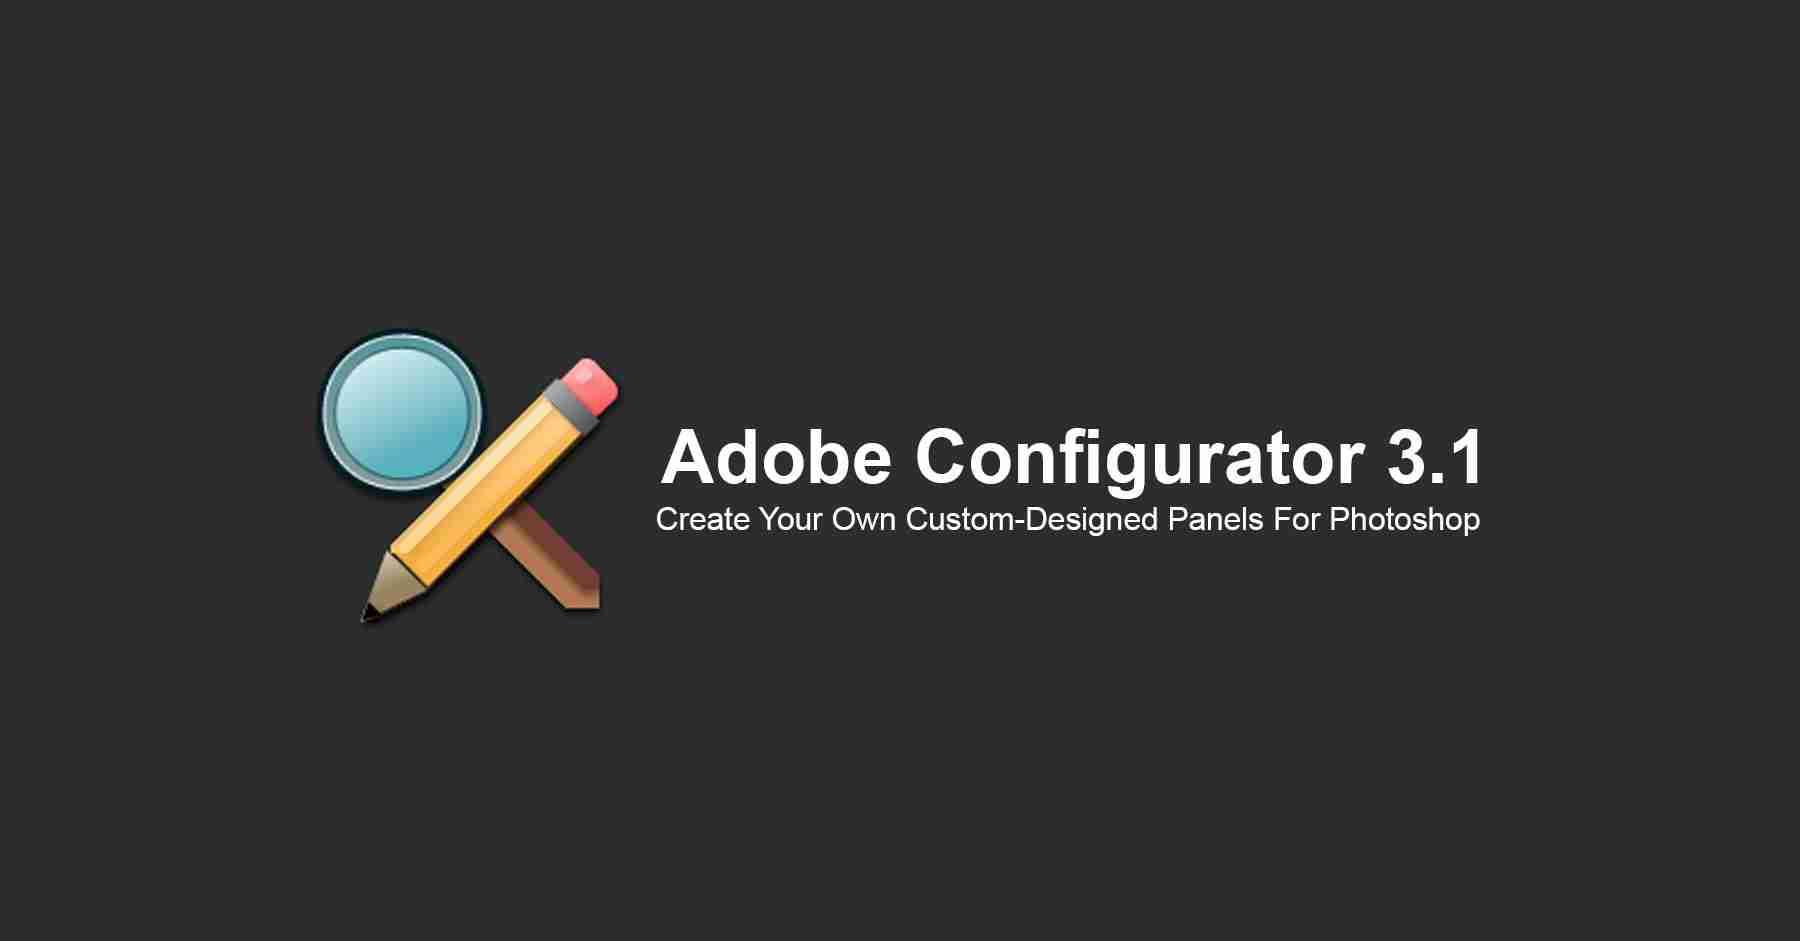 Photoshop CC 2018 Tutorials - What's NEW in Adobe Photoshop